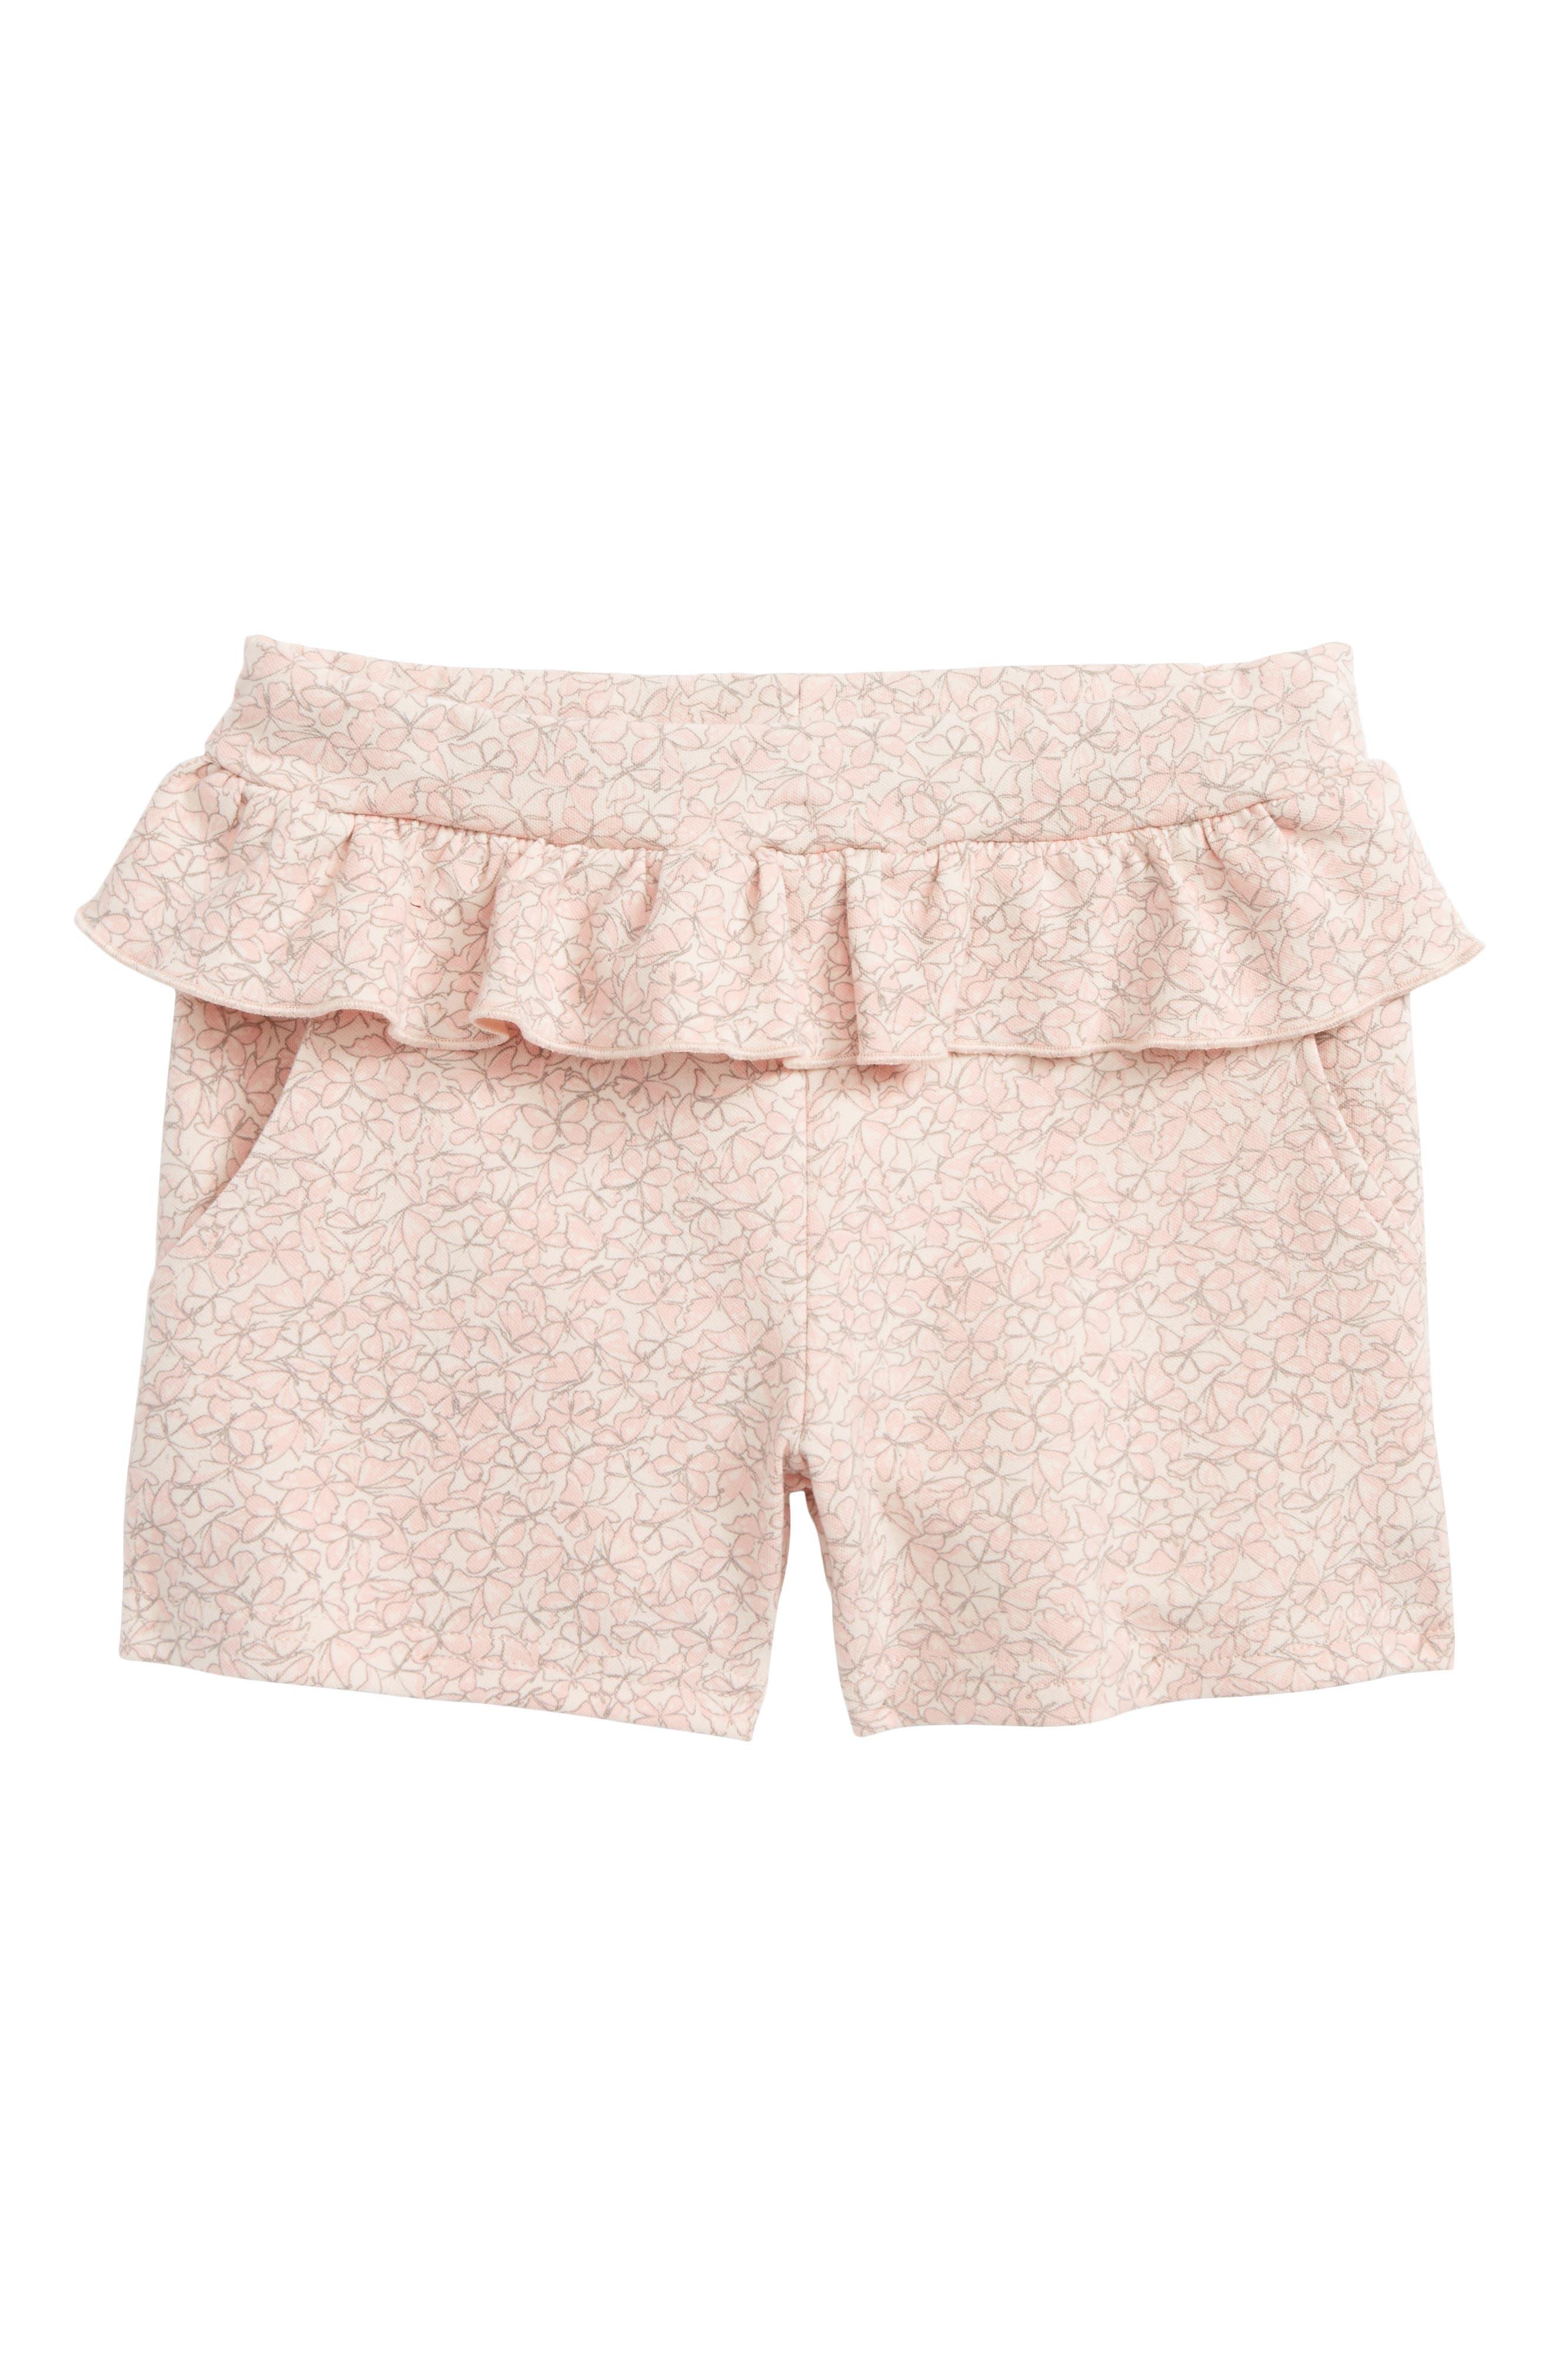 Wheat Butterfly Ruffle Shorts (Toddler Girls, Little Girls & Big Girls)